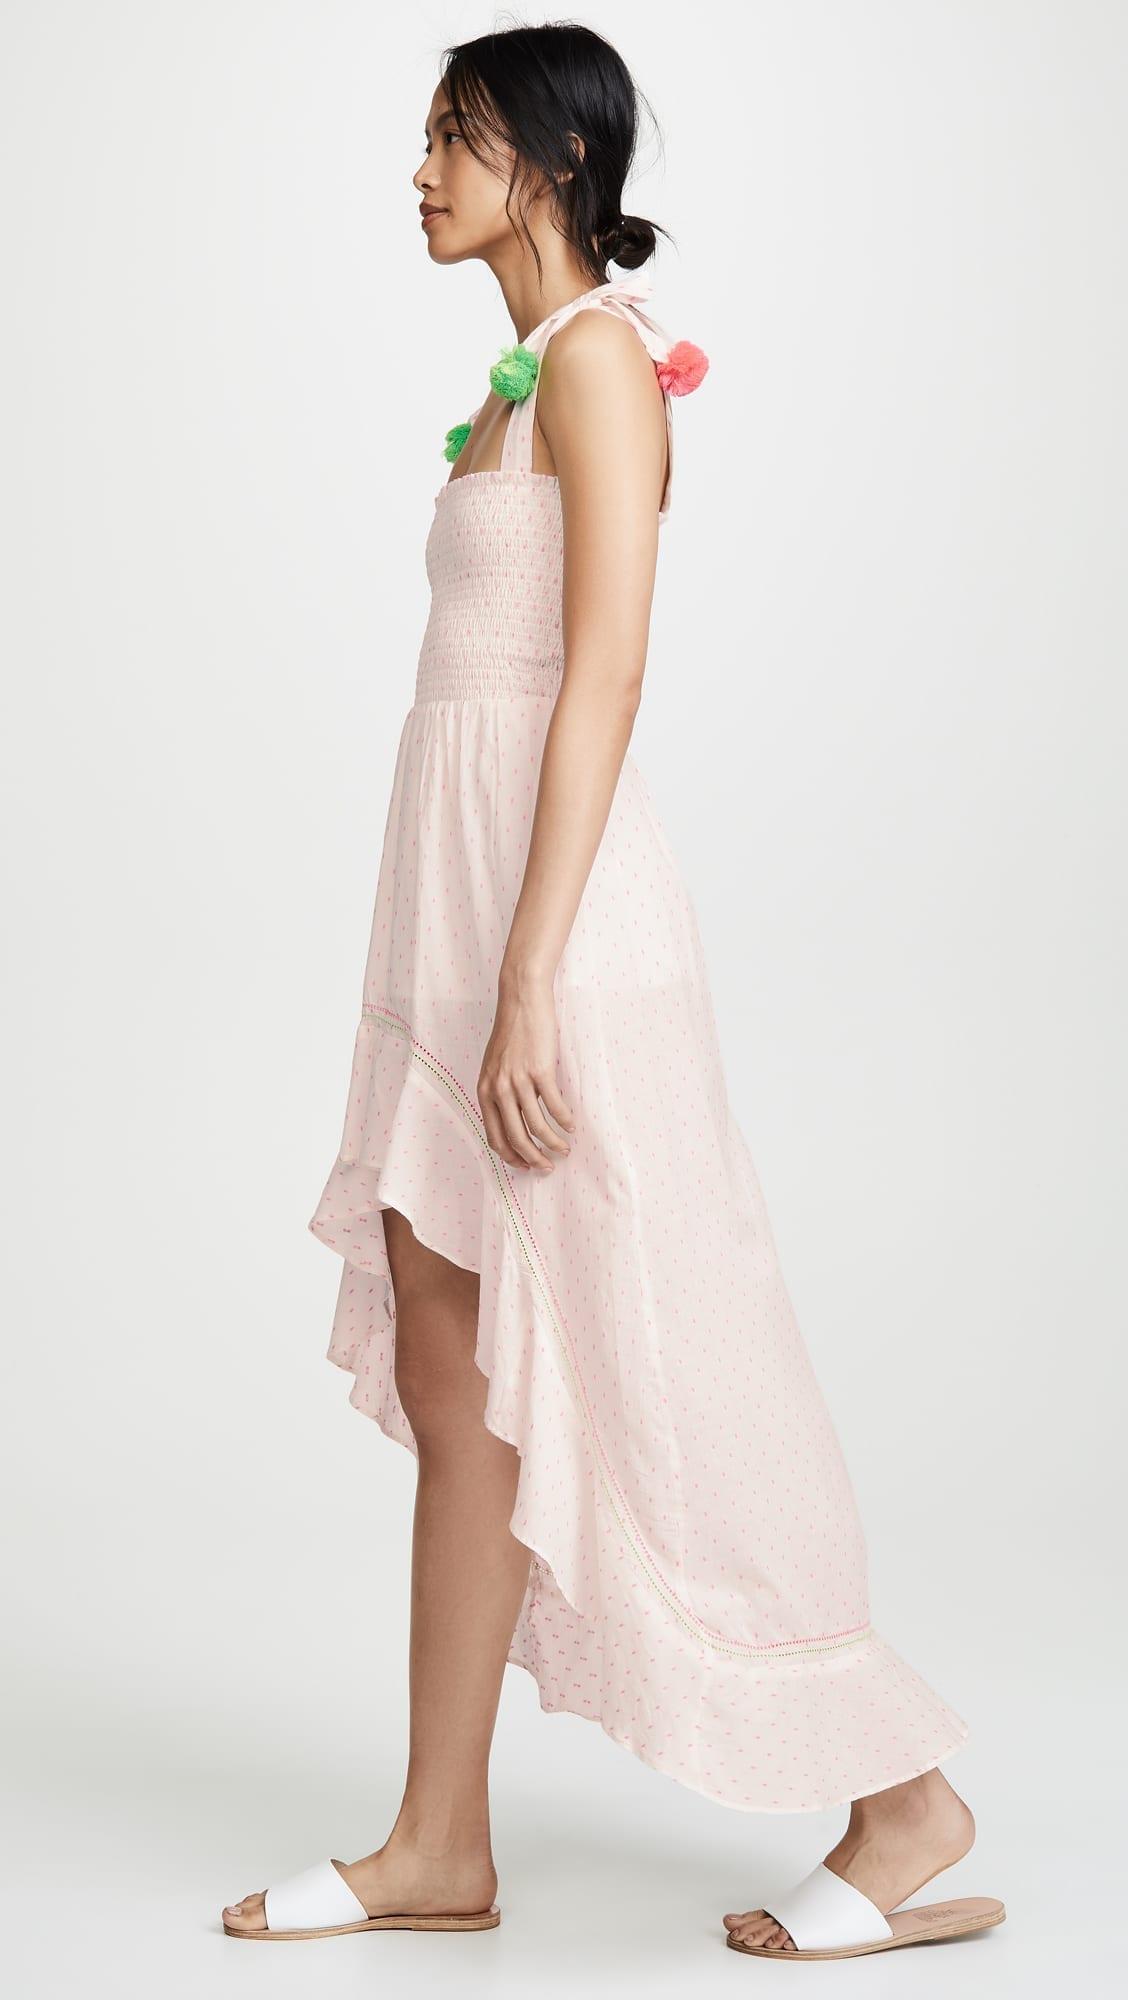 Kos Resort Pom Pom Pink Dress We Select Dresses